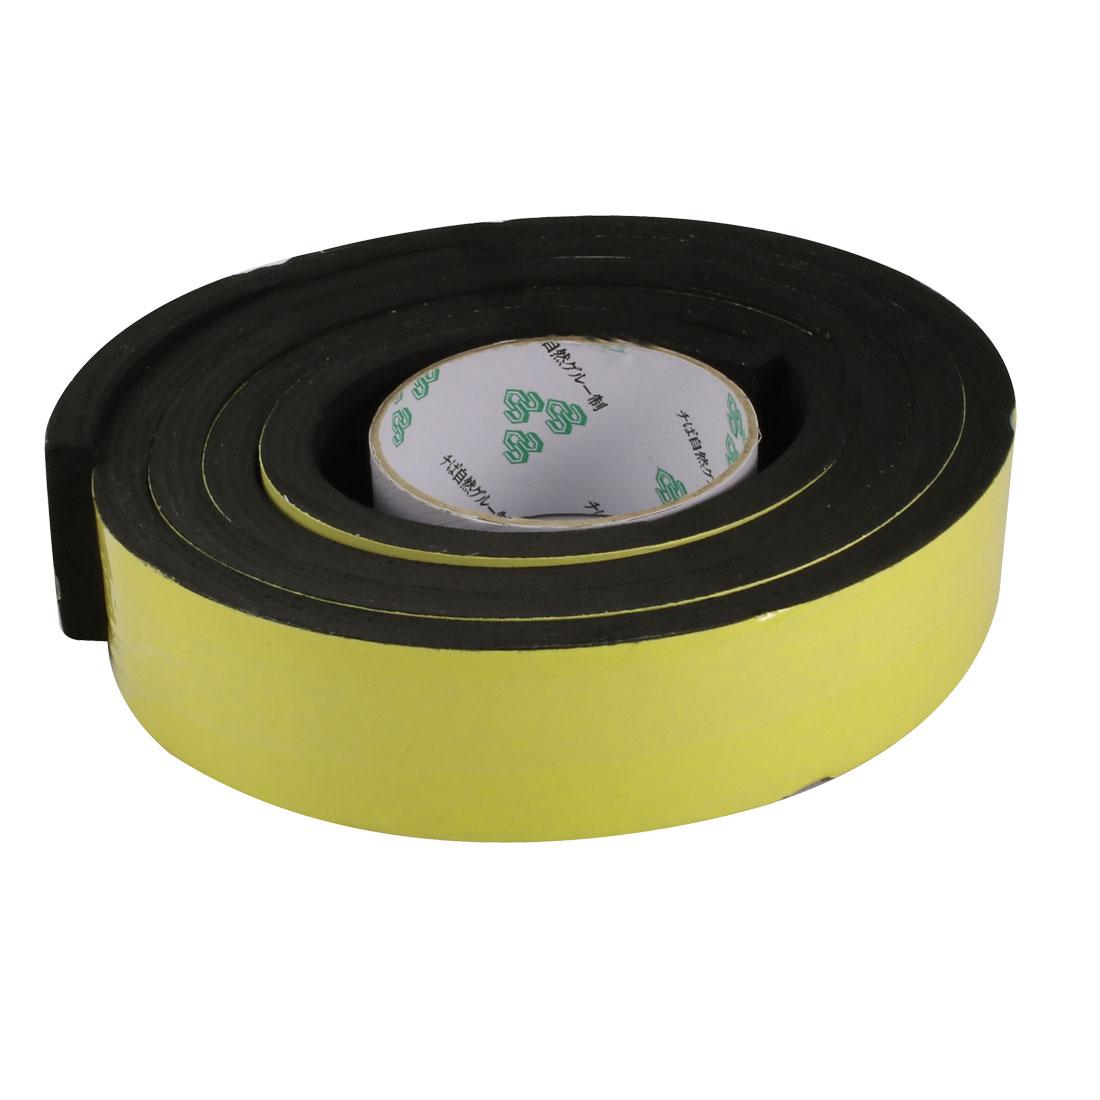 45mm Wide 10mm Thick Single Sided Shockproof EVA Sponge Tape Black 2 Meters Long